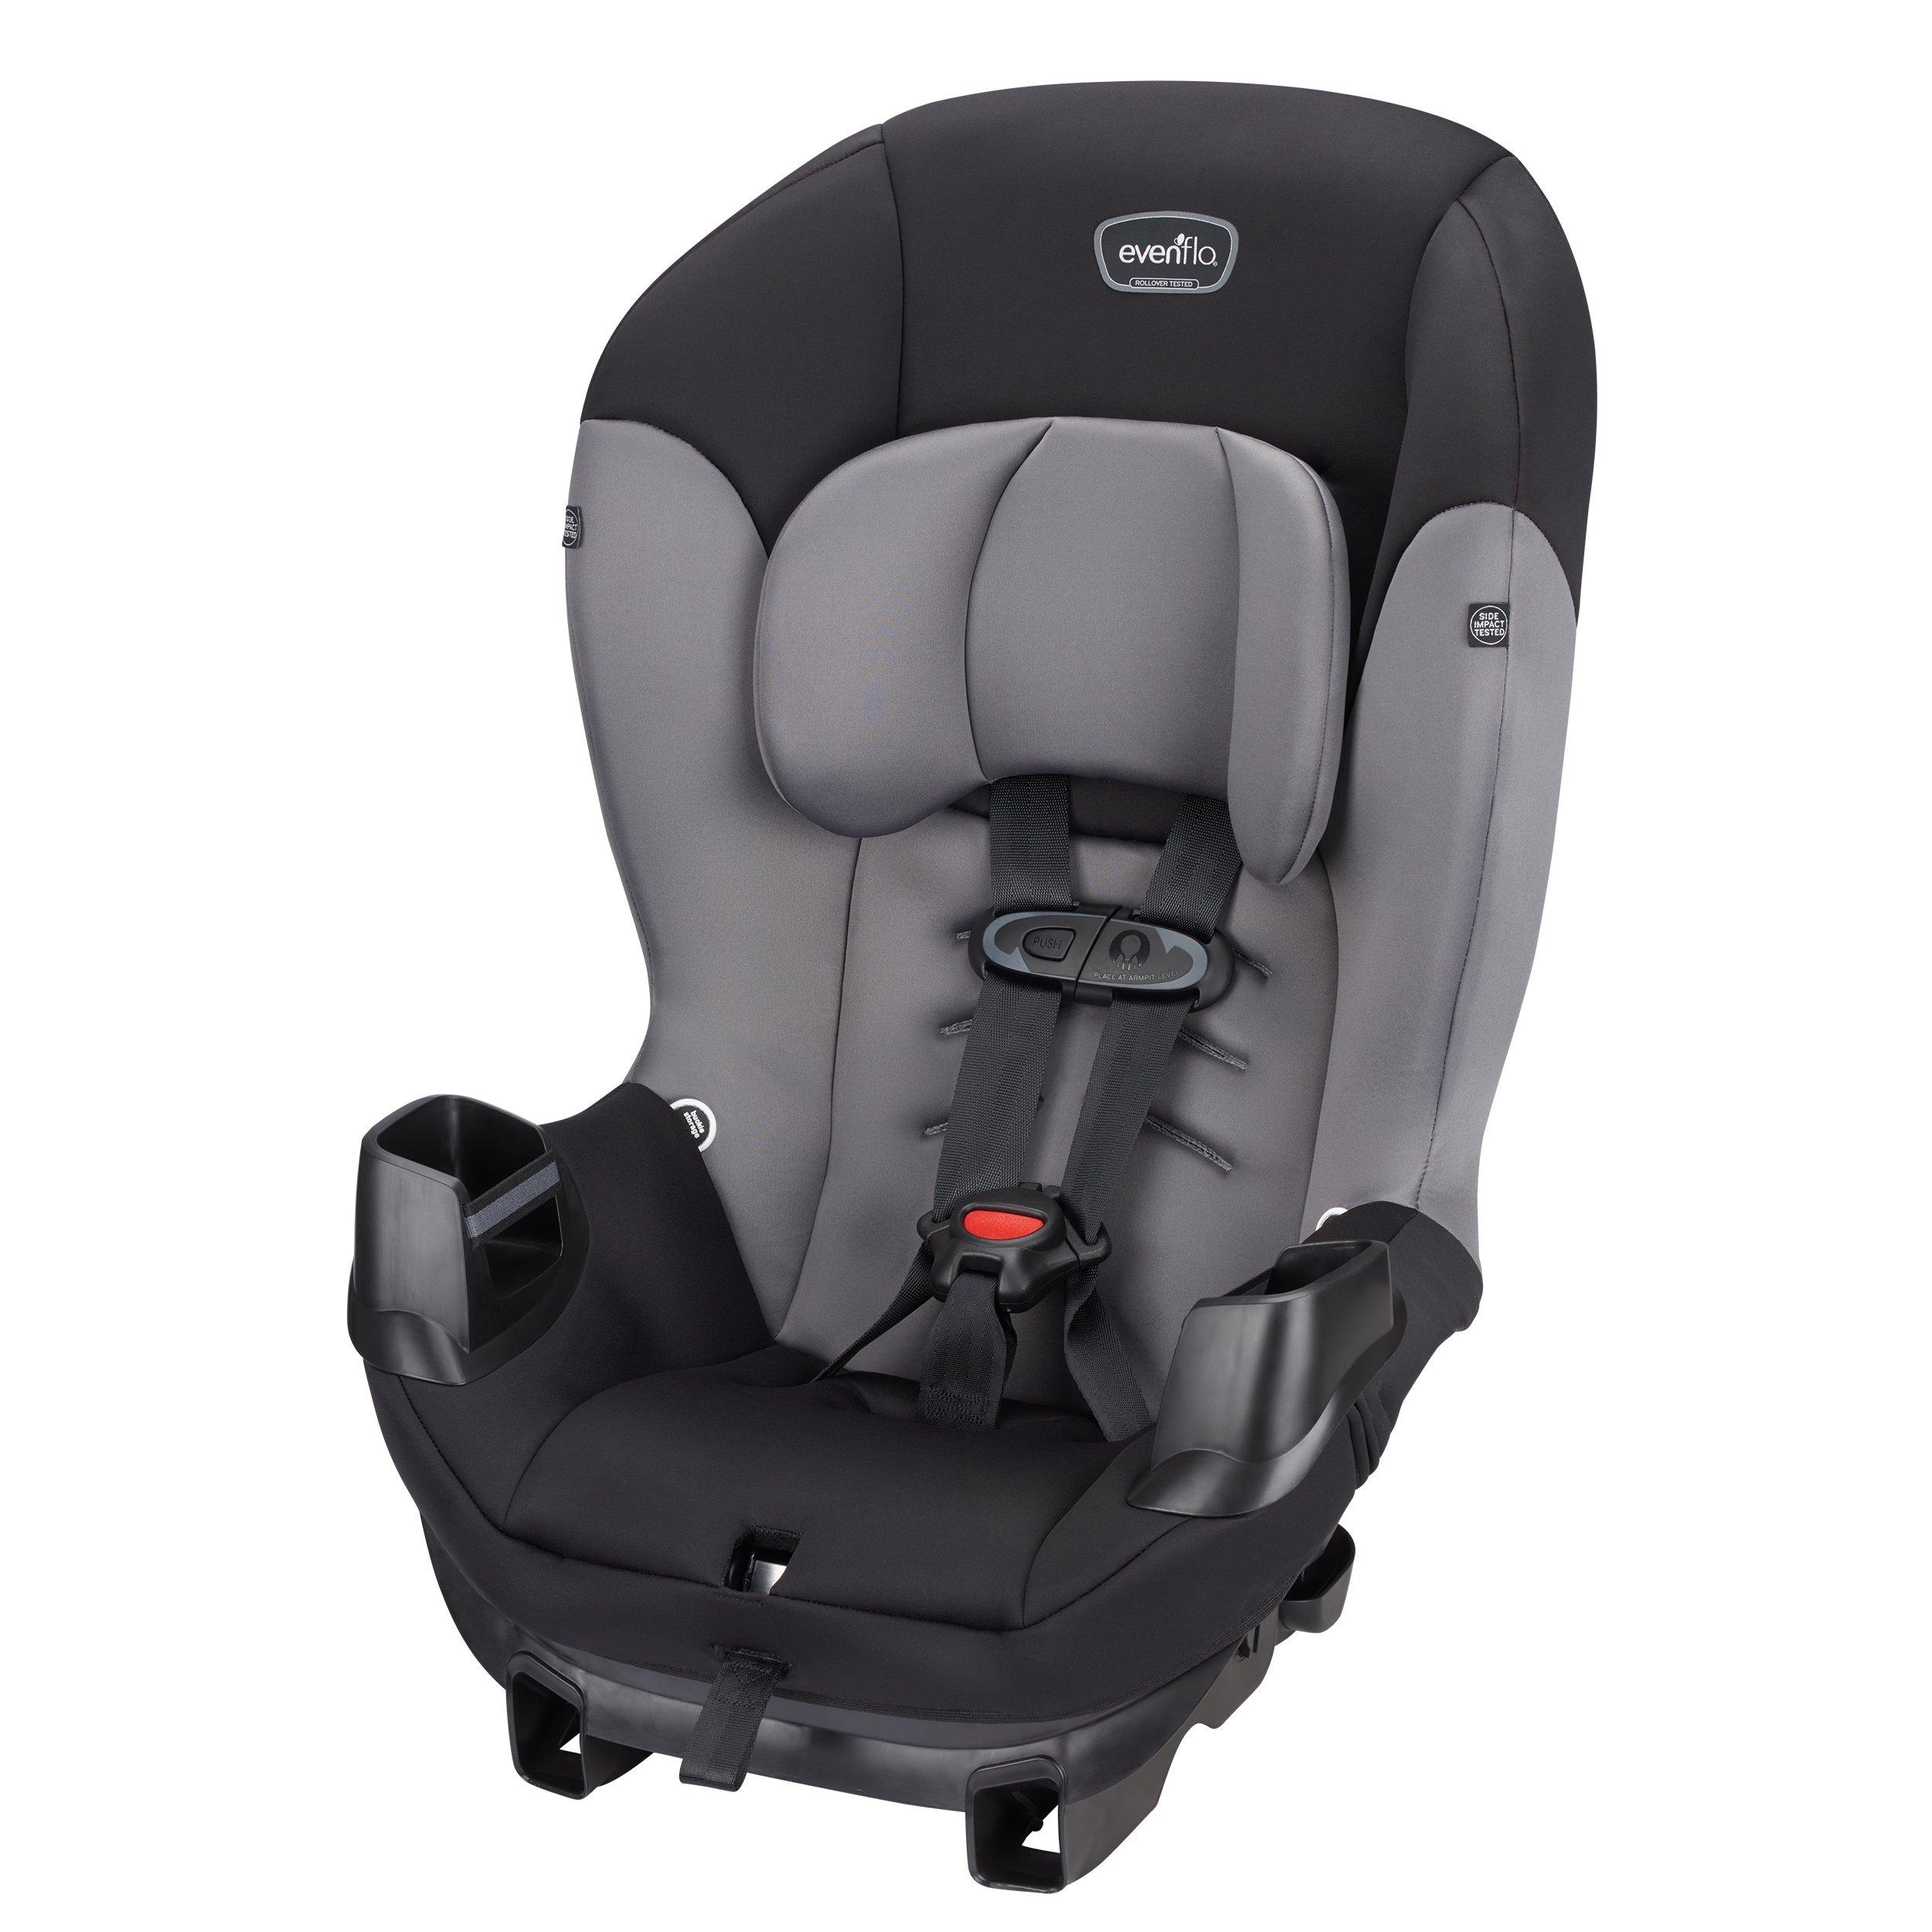 Evenflo Sonus Convertible Seat Charcoal